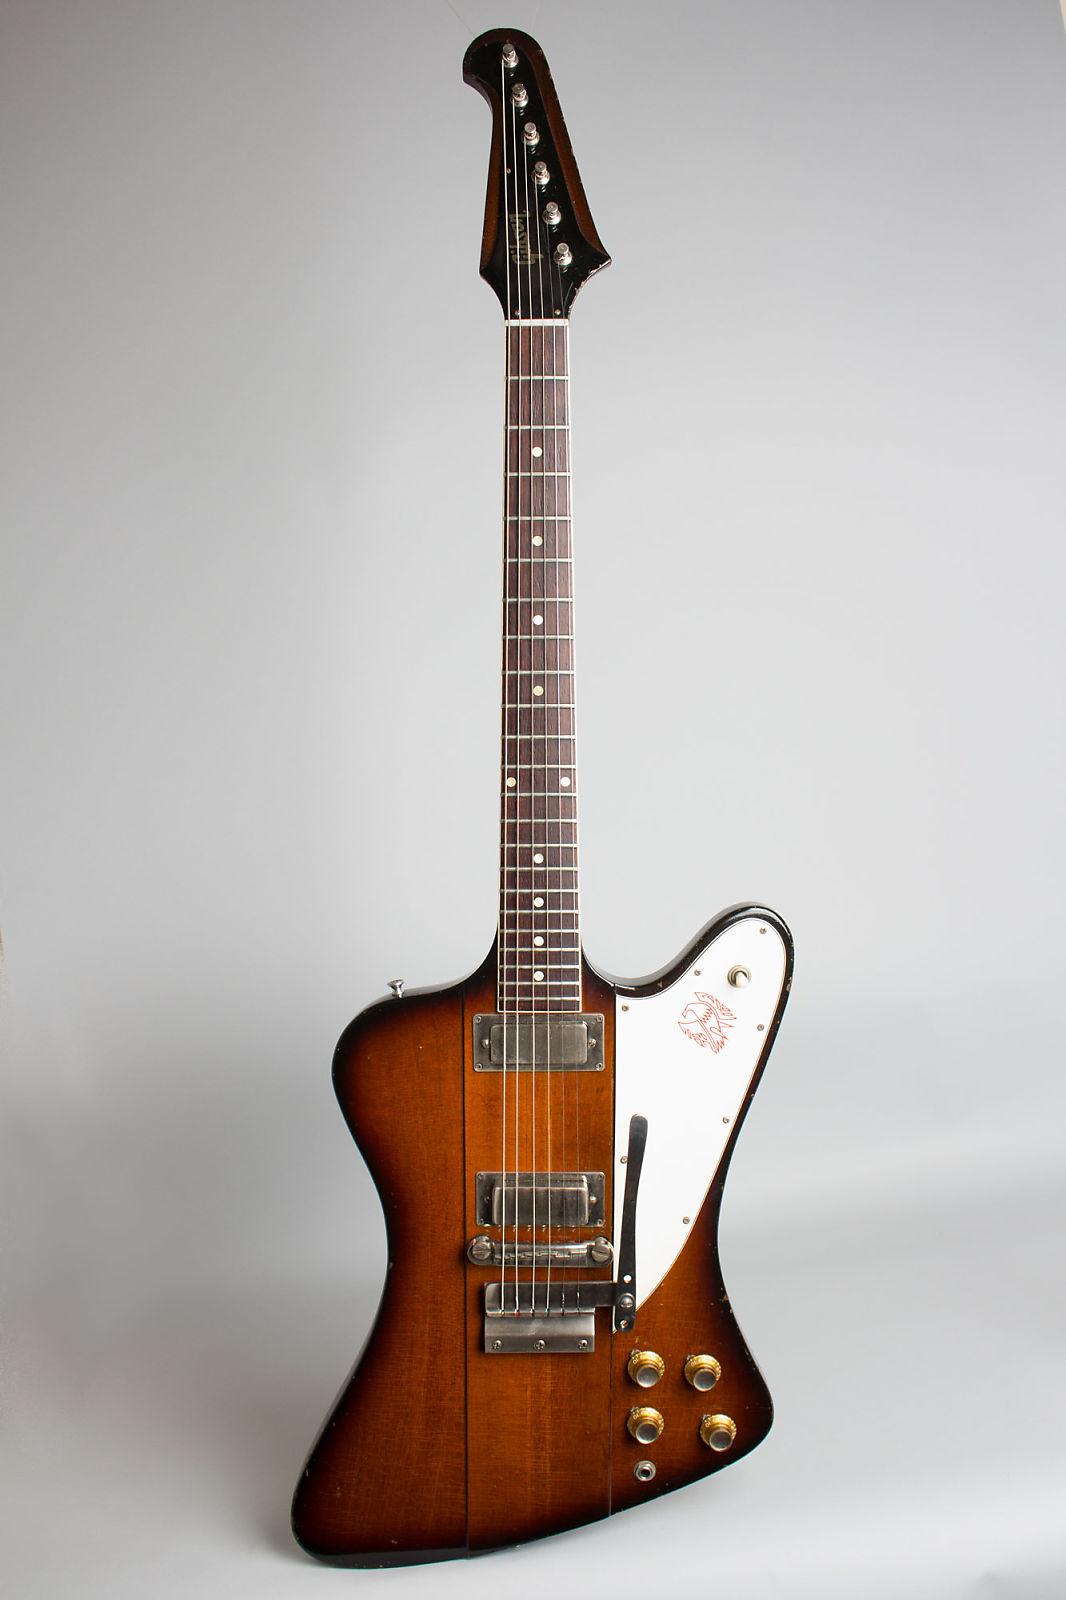 Gibson Firebird Iii Solid Body Electric Guitar 1964 Ser 153616